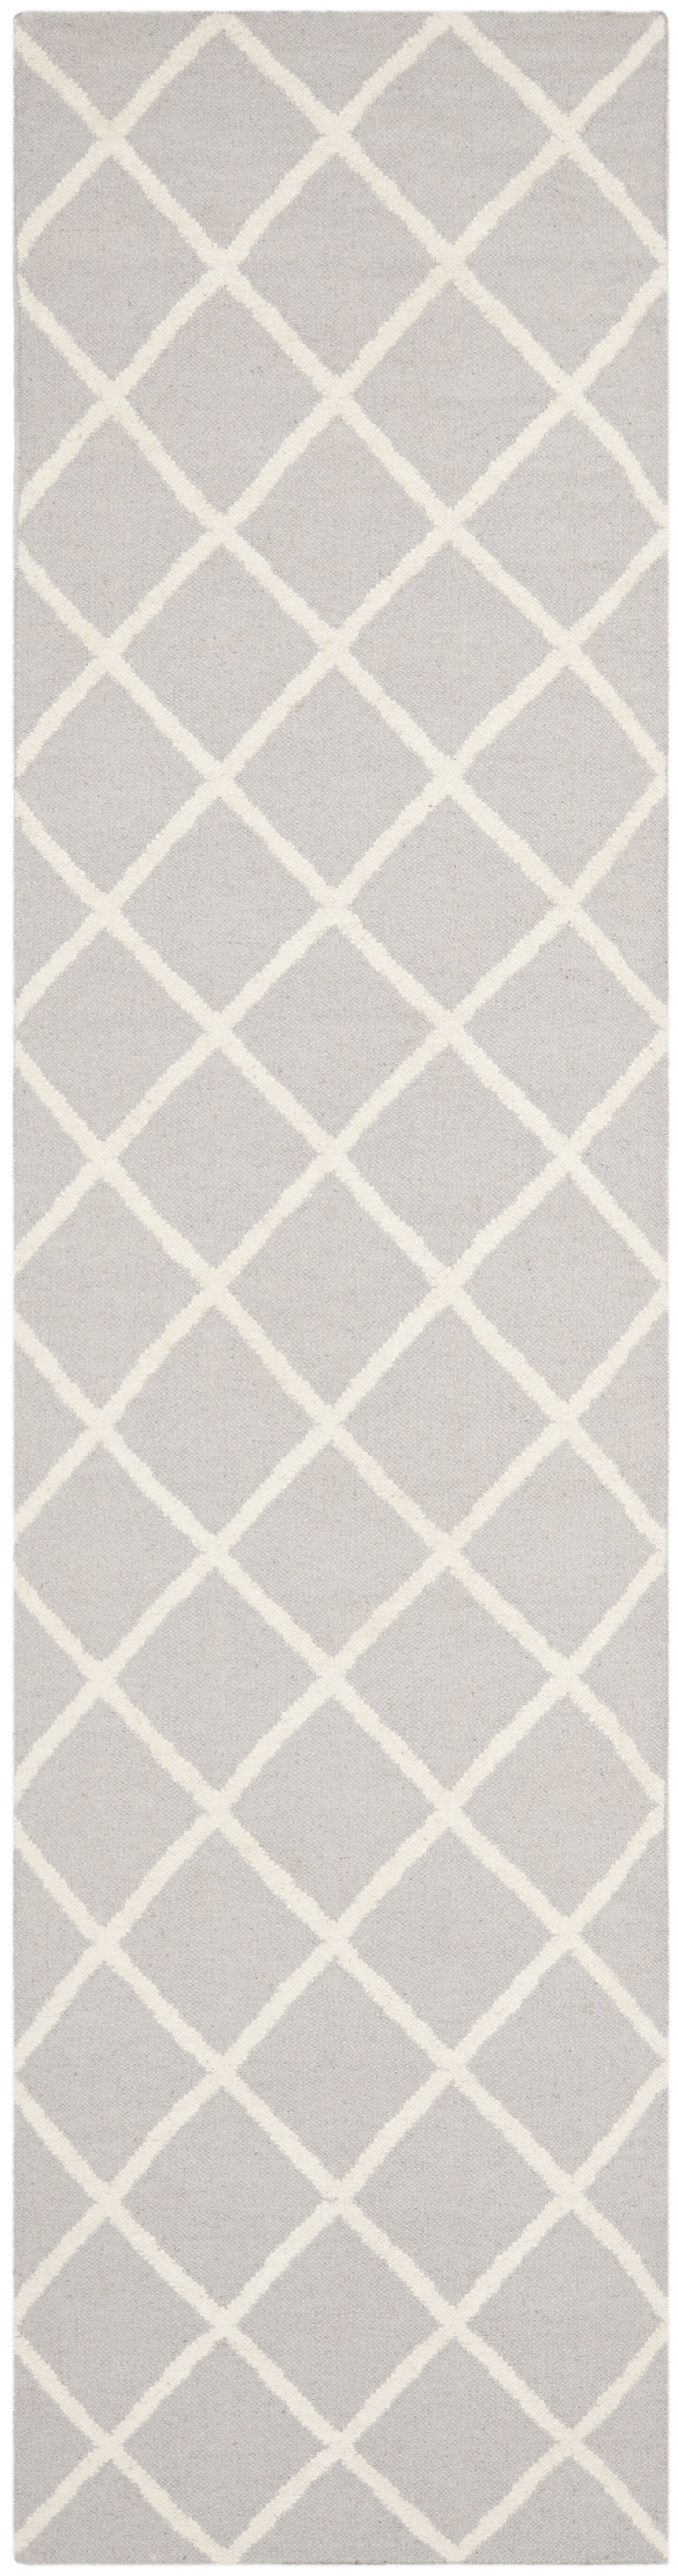 Danbury Hand-Woven Wool Gray/Ivory Area Rug Rug Size: Runner 2'6